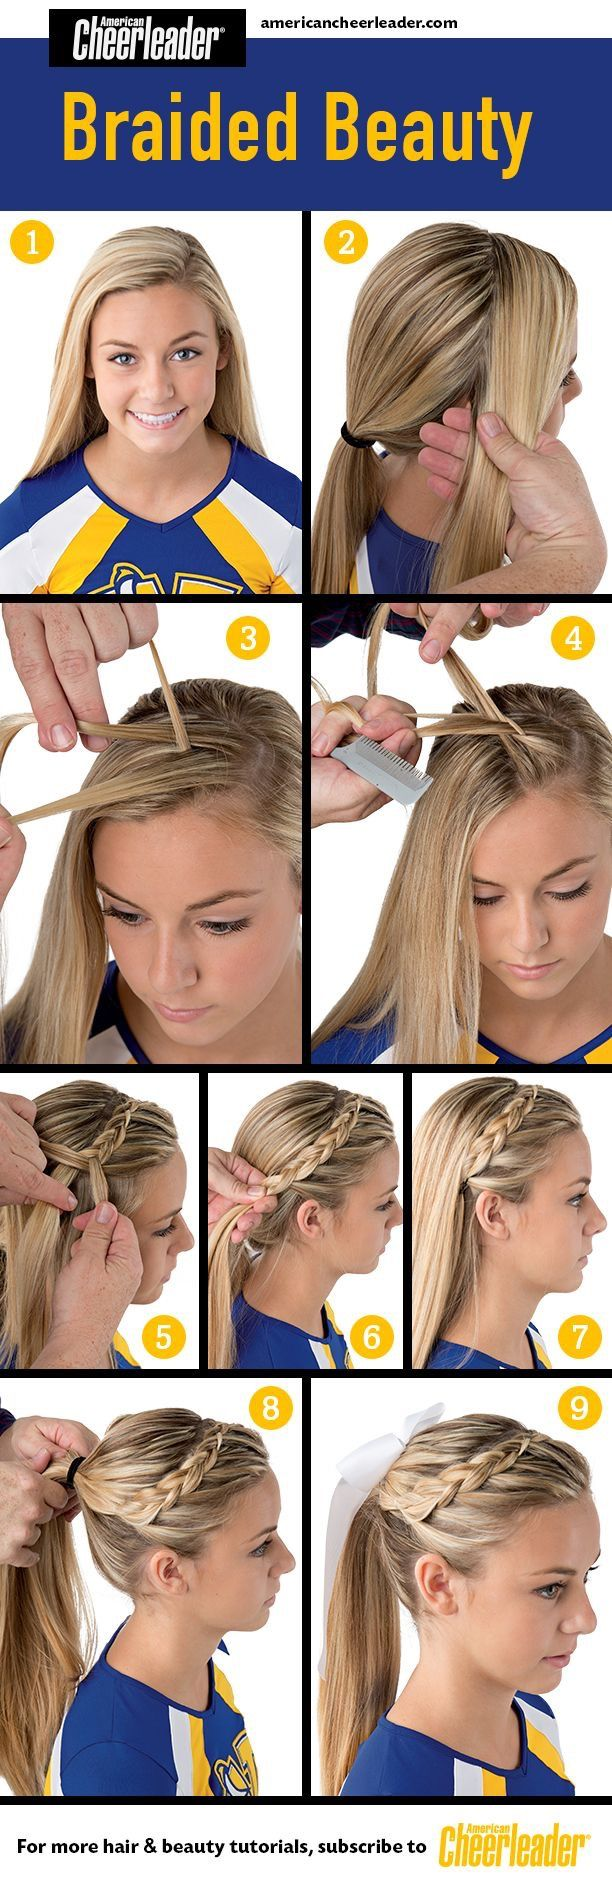 Pin by angela guse on cady pinterest cheer cheer hair and hair